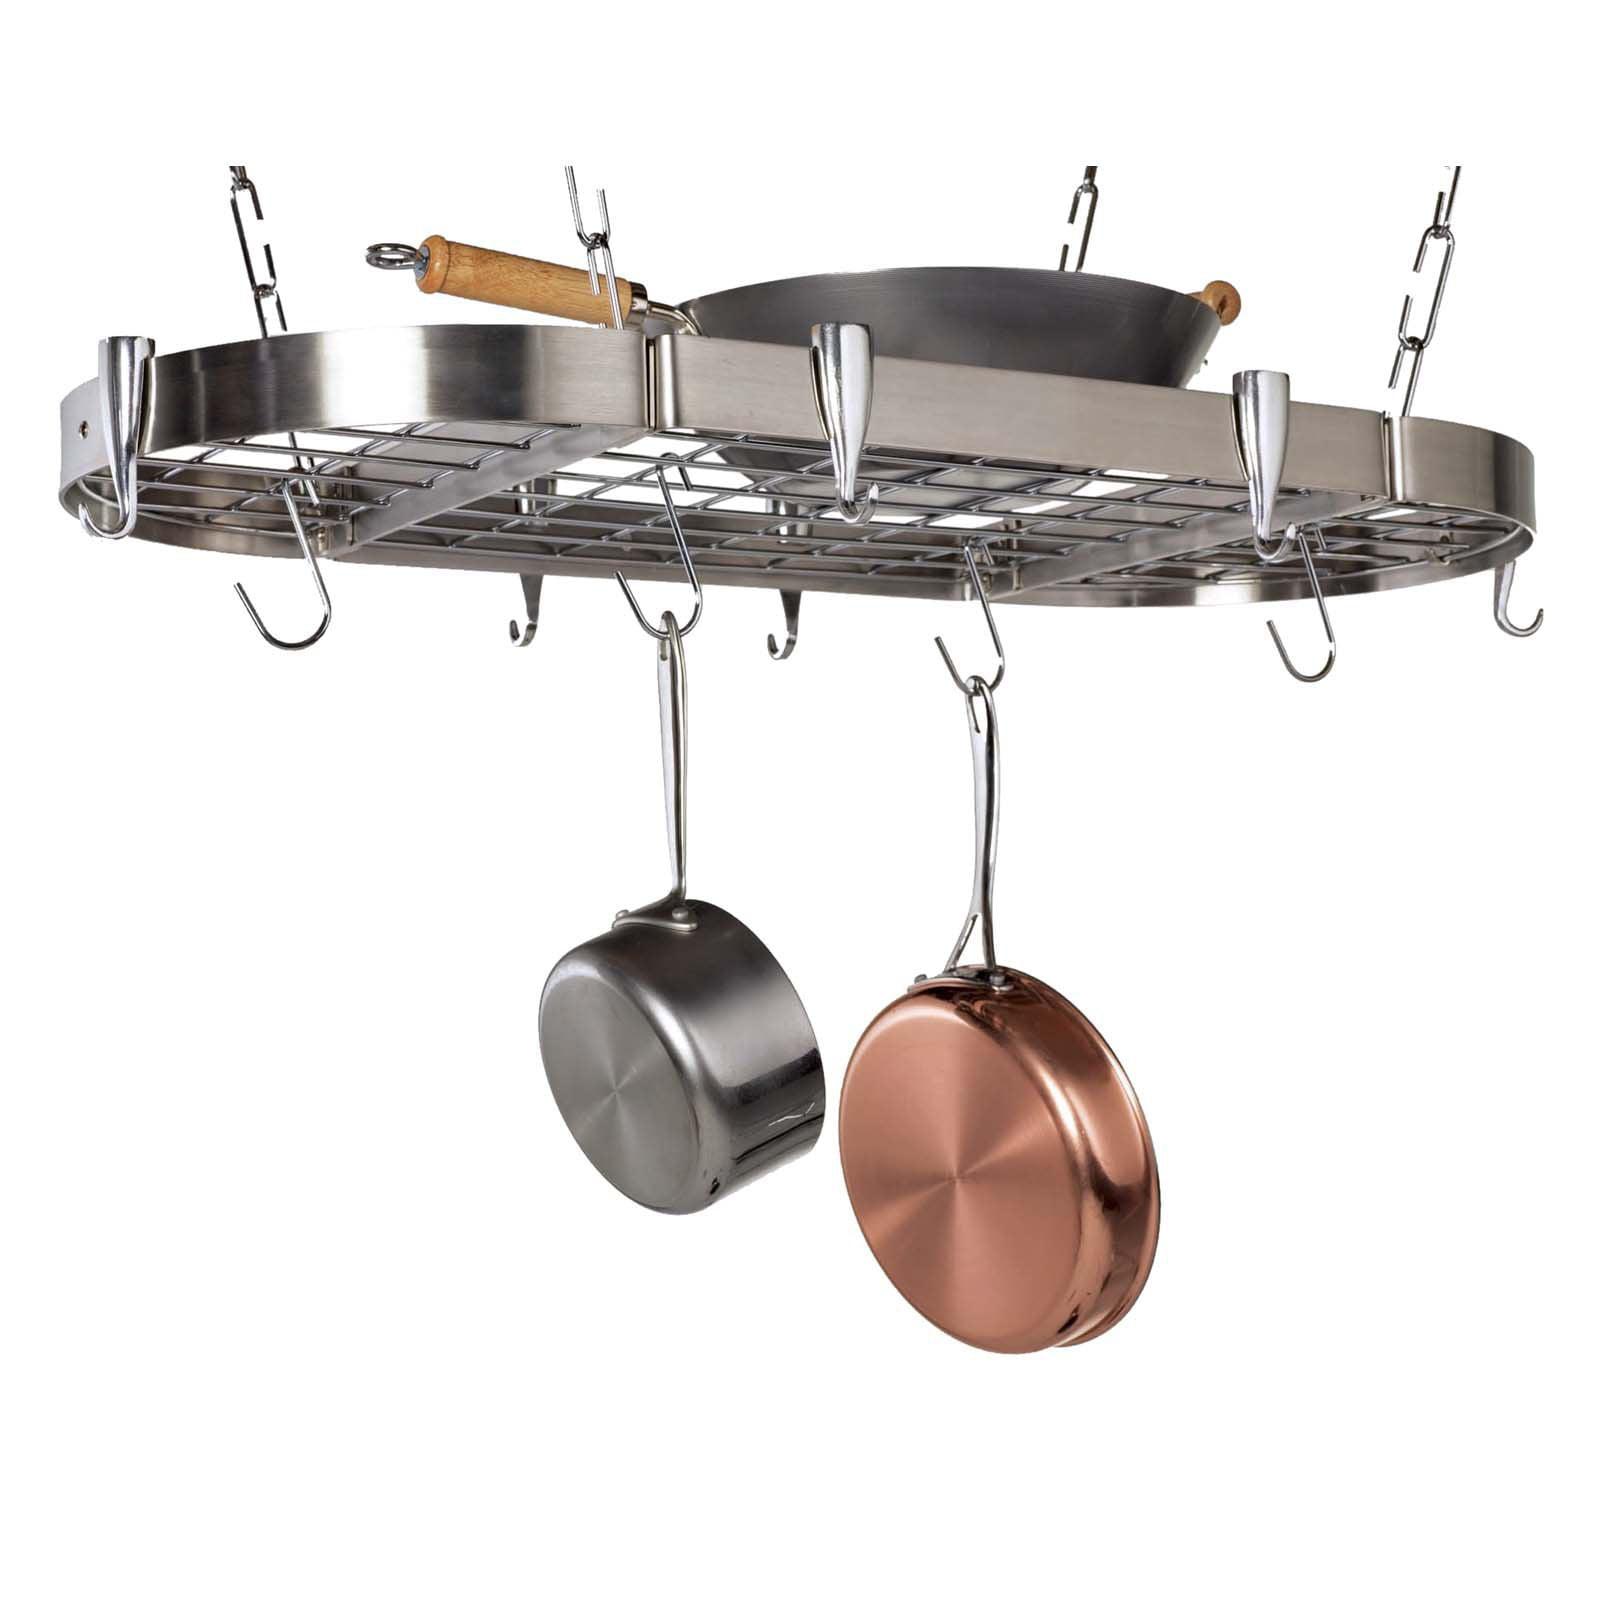 Carta Stainless Steel Oval Pot Rack